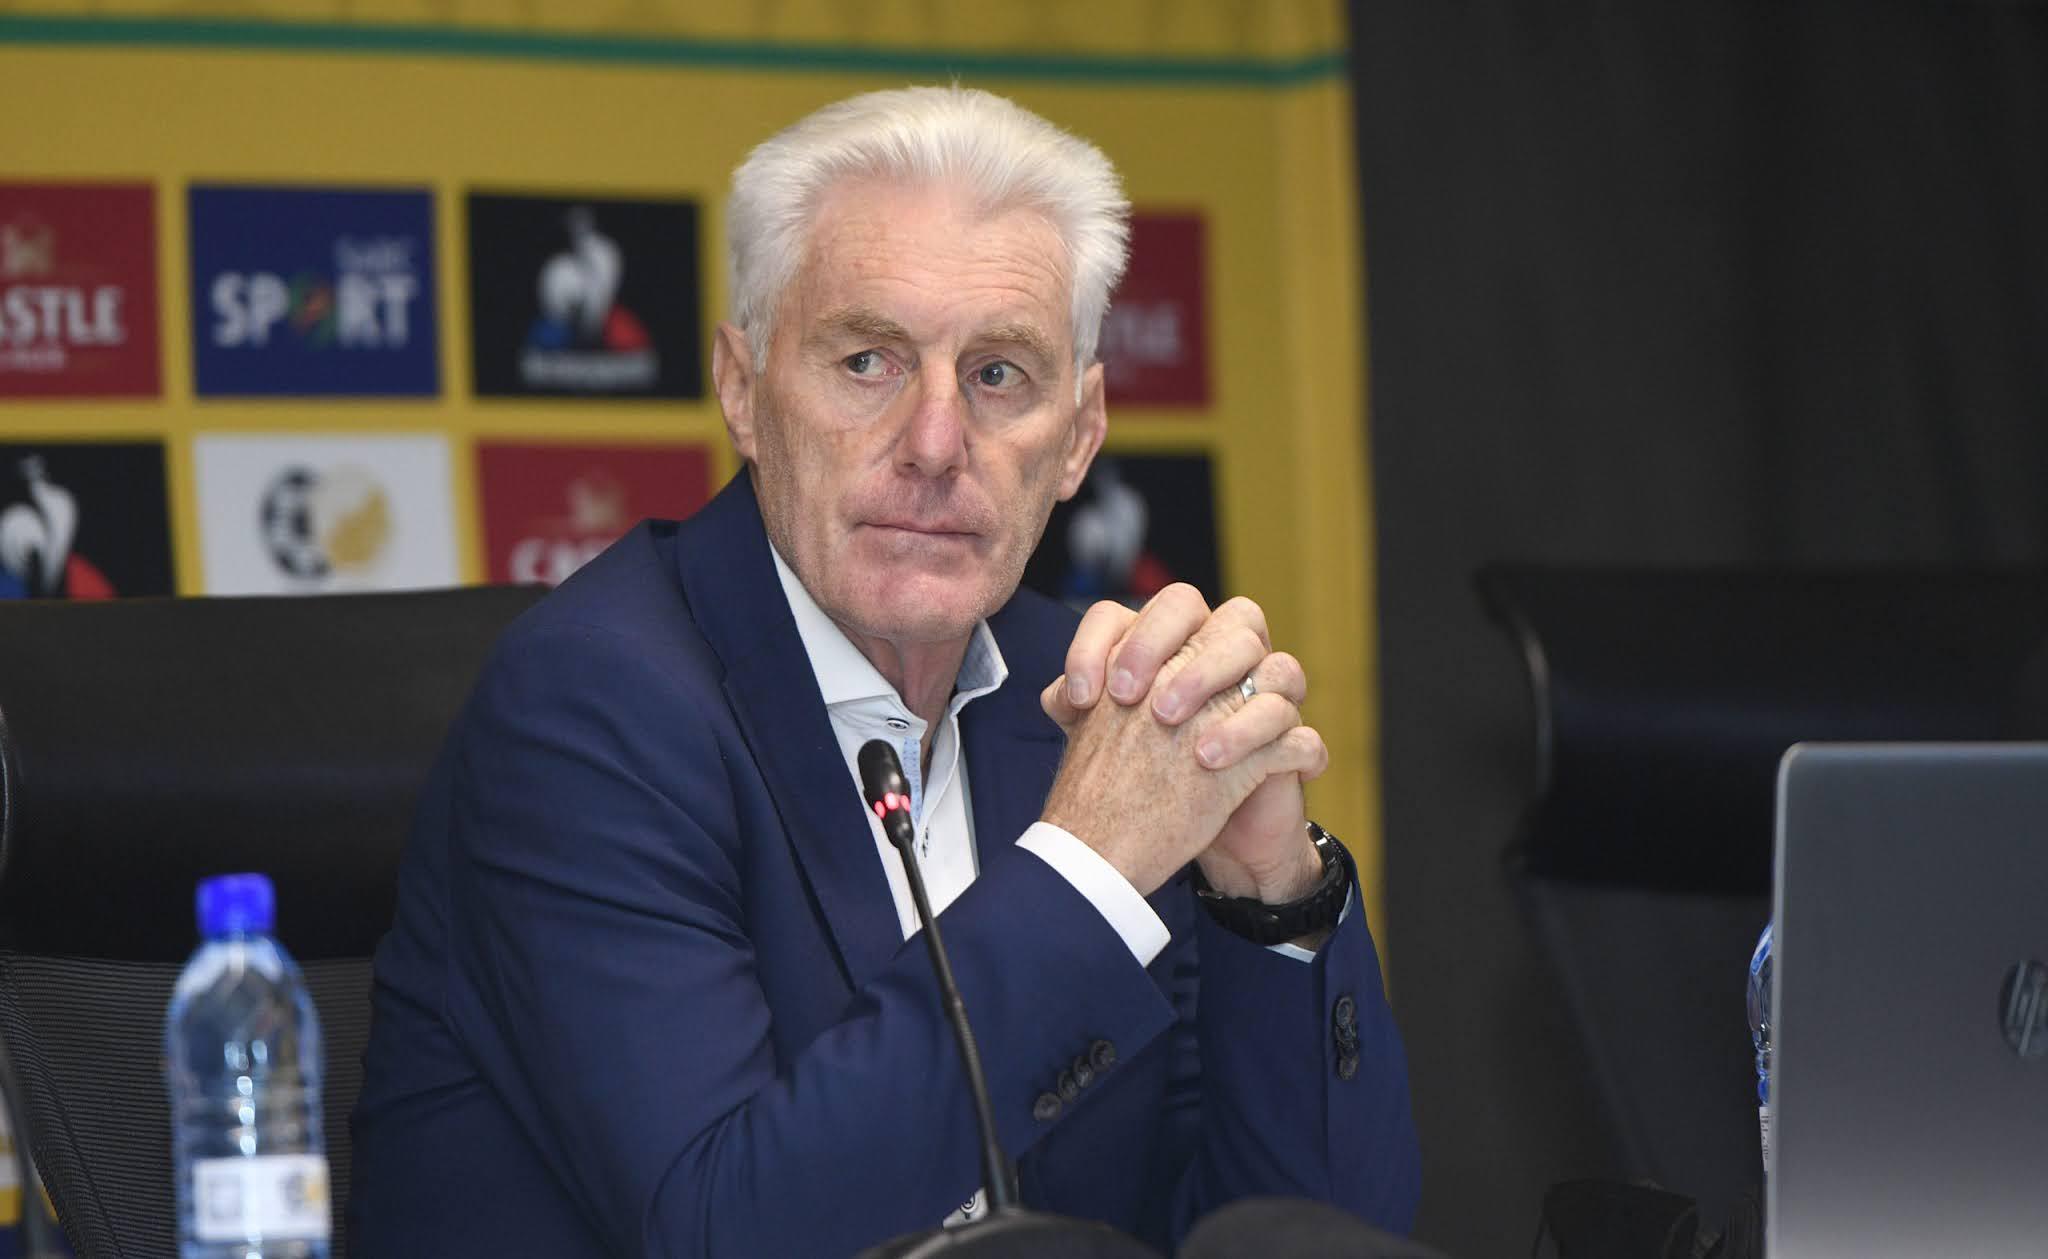 South Africa's head coach Hugo Broos